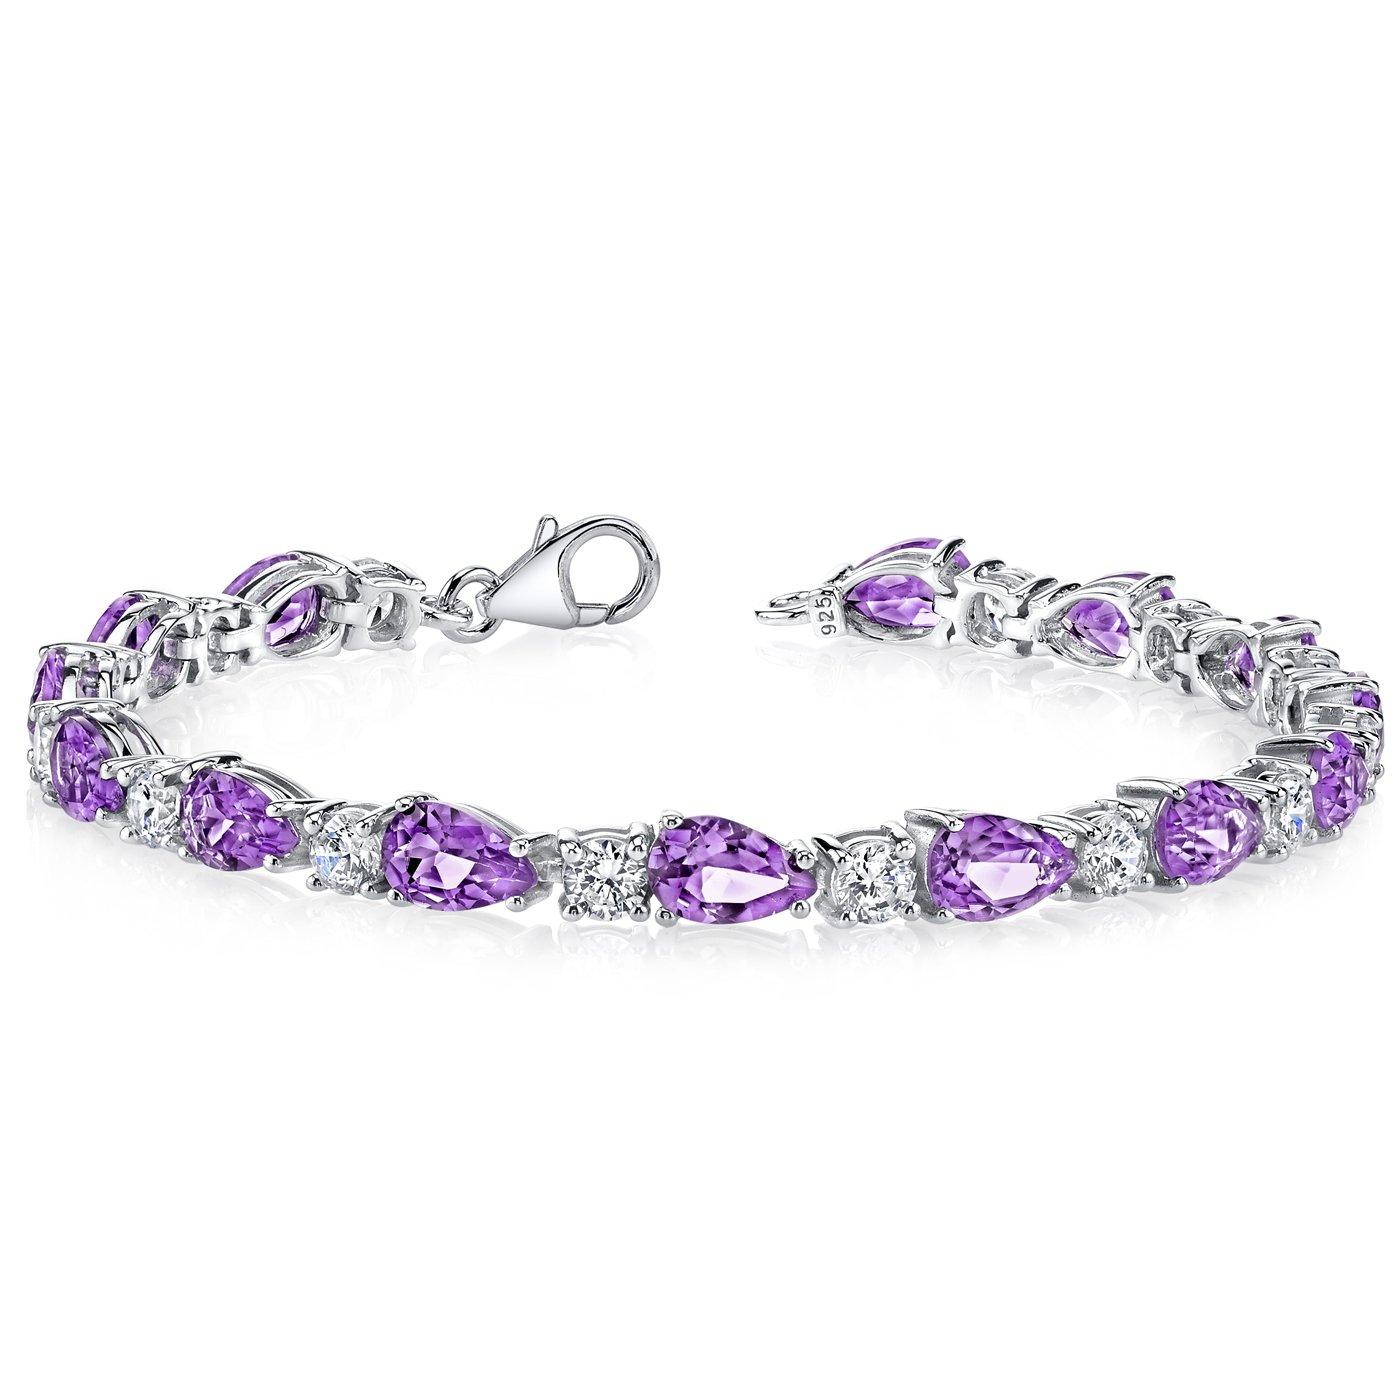 10.00 Carats Amethyst Tennis Bracelet Sterling Silver Rhodium Nickel Finish Pear Shape